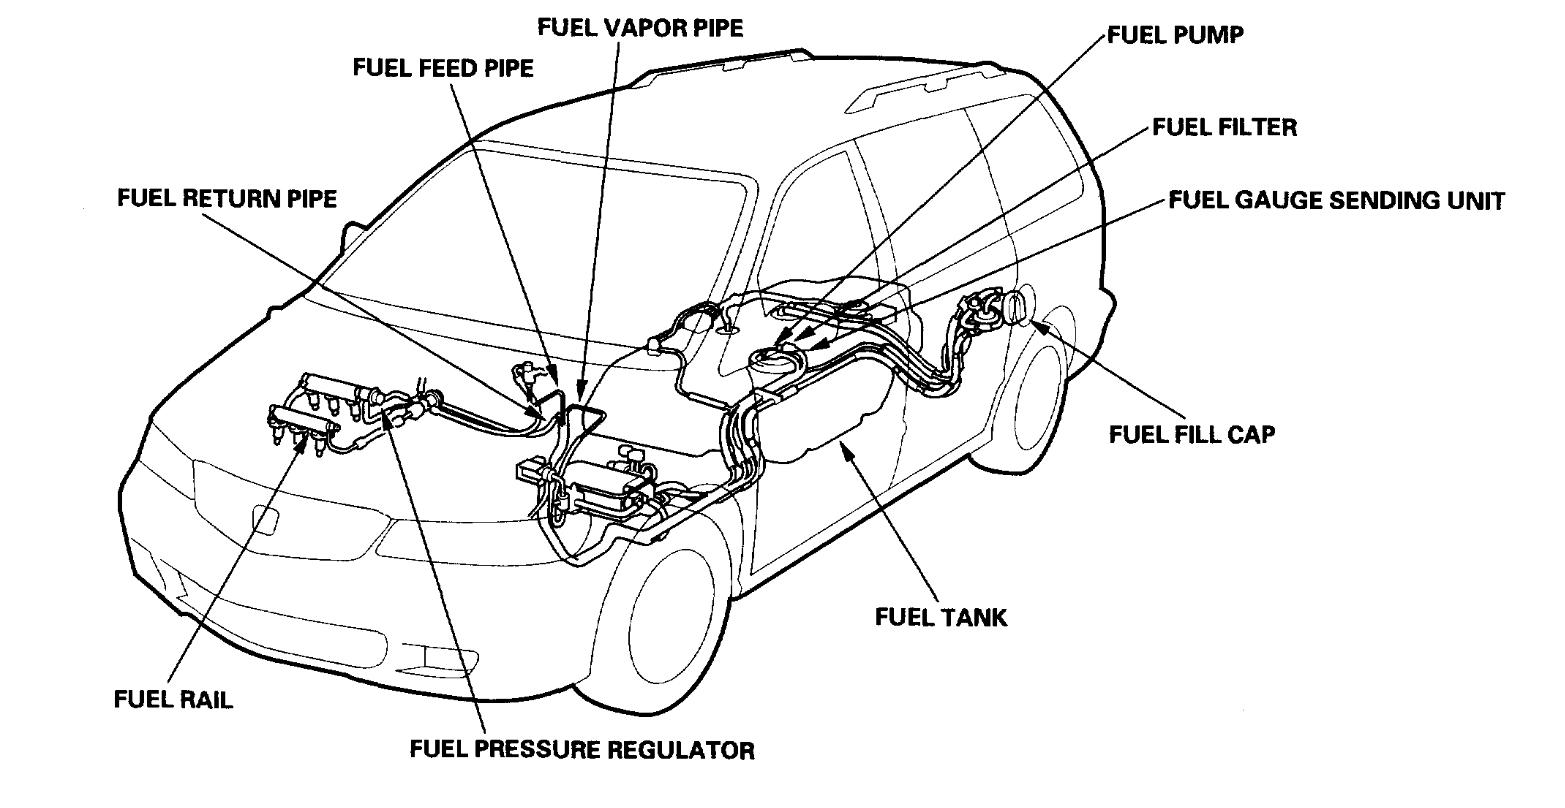 2007 honda civic fuel filter replacement